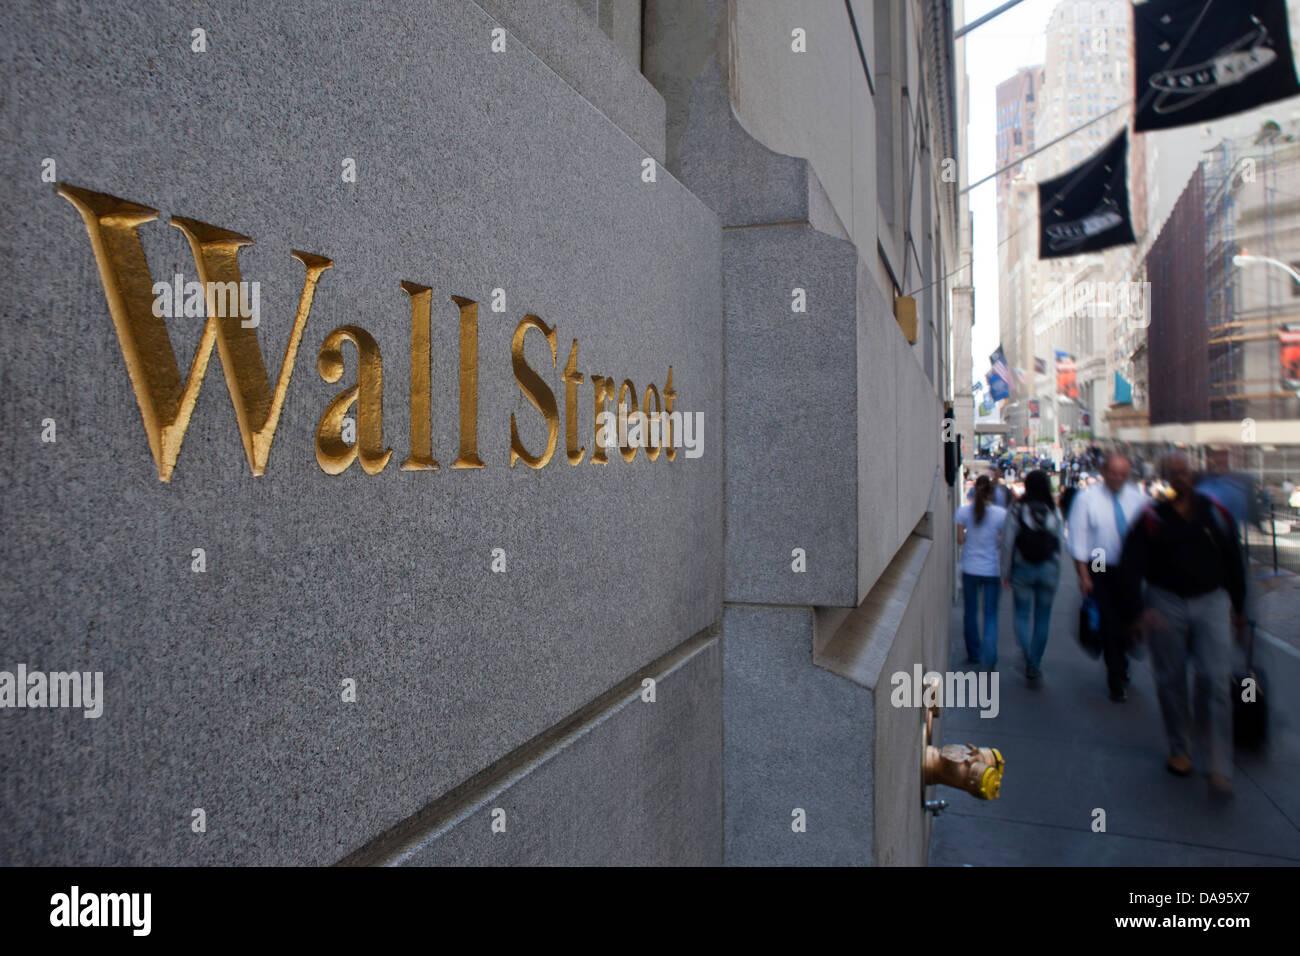 PEOPLE WALKING PAST WALL STREET SIGN DOWNTOWN MANHATTAN NEW YORK USA - Stock Image